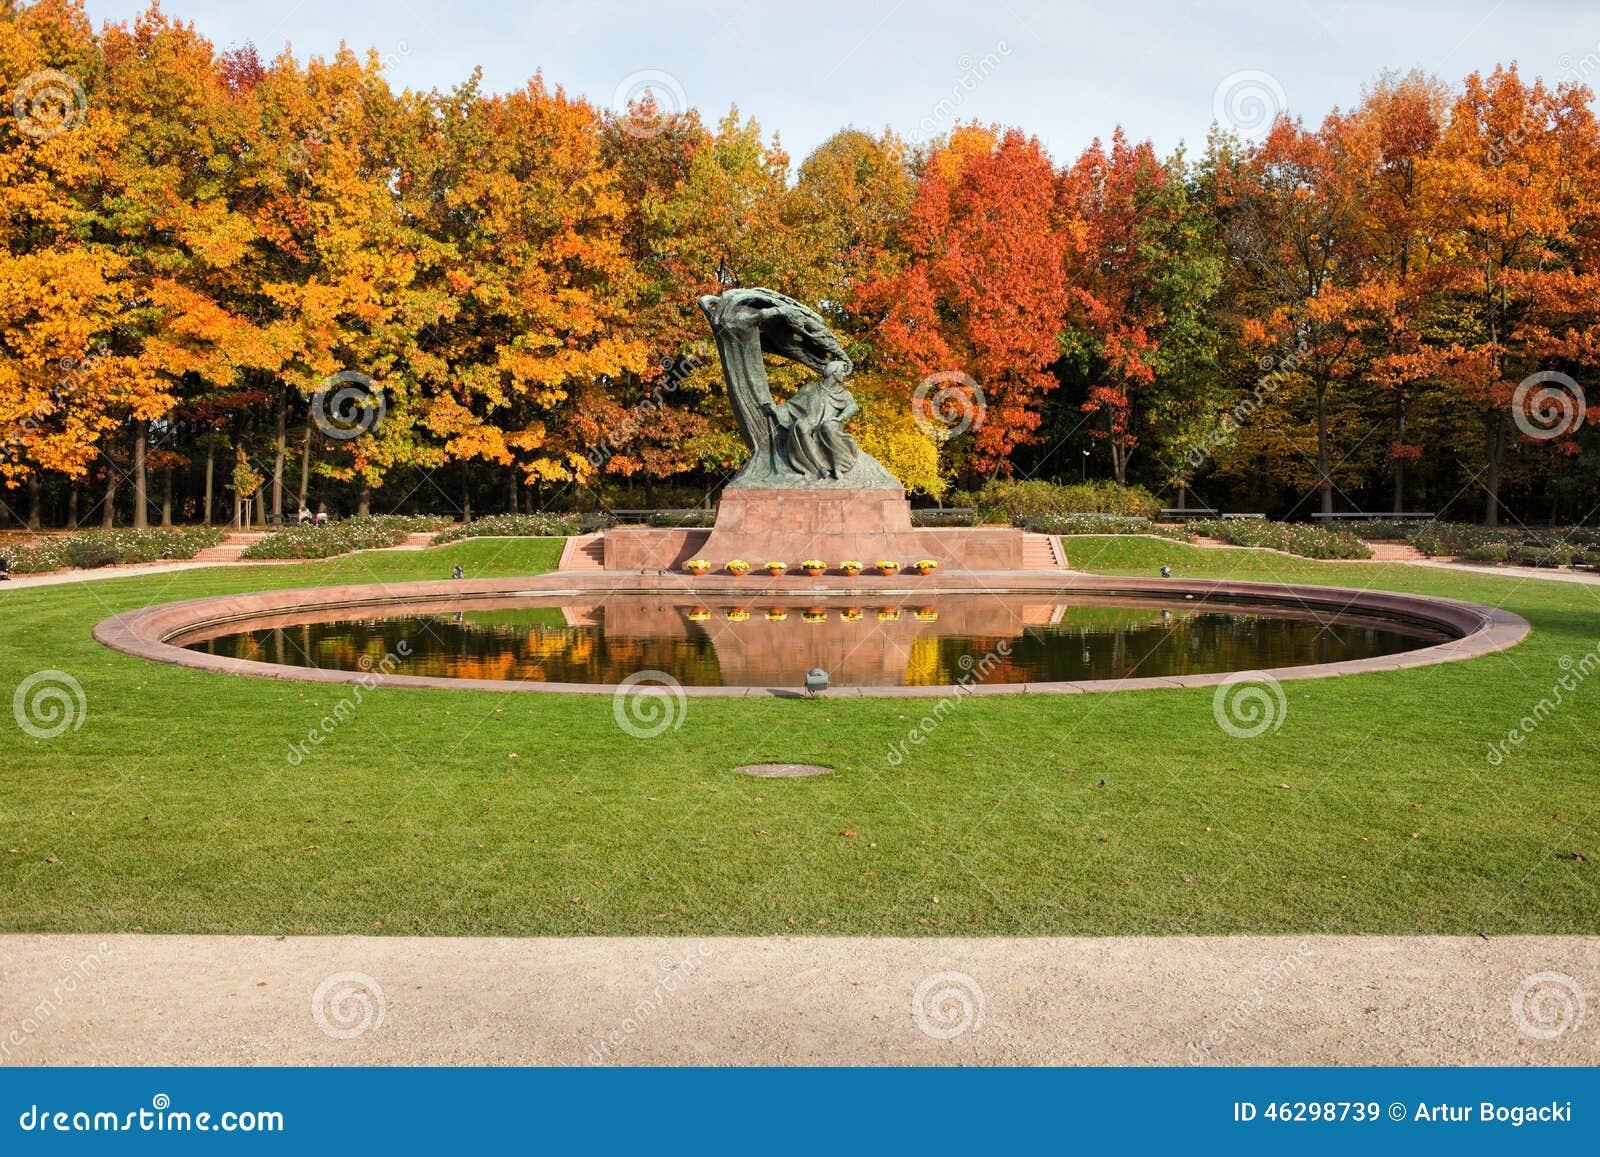 Oto o en los jardines reales de lazienki en varsovia foto for Jardines en otono